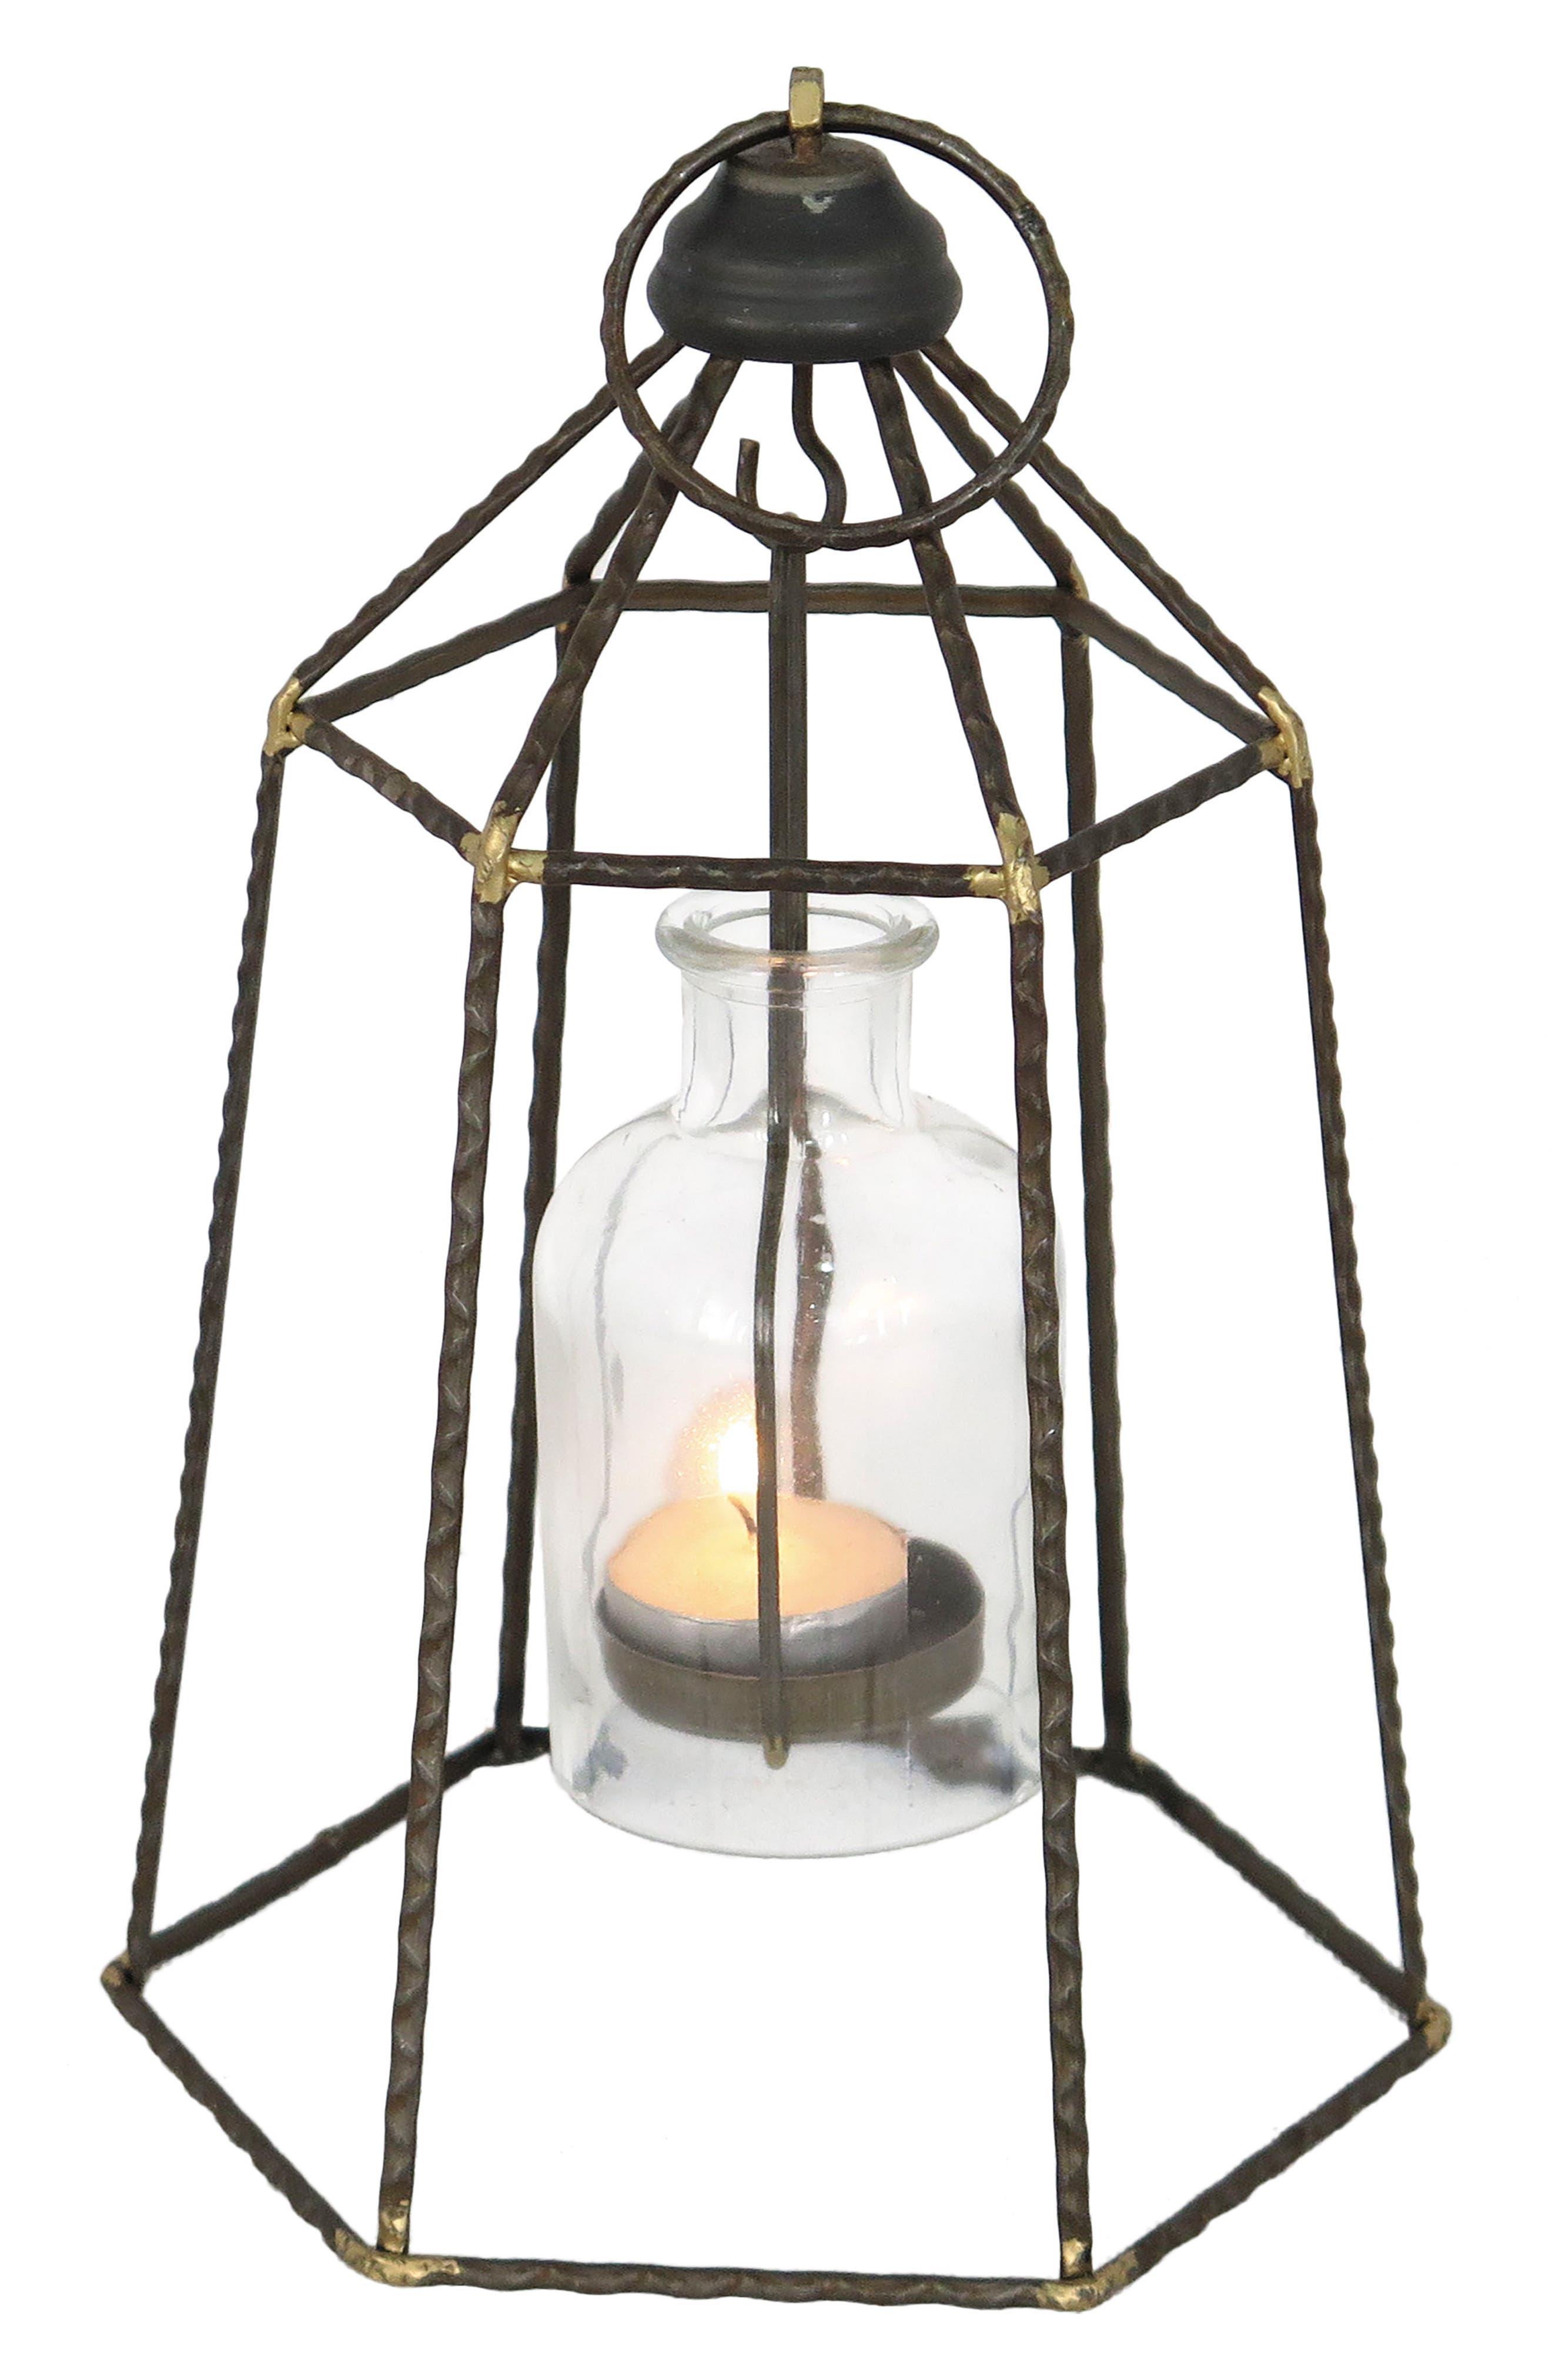 Small Pendant Votive Candleholder,                             Main thumbnail 1, color,                             METAL/ GLASS